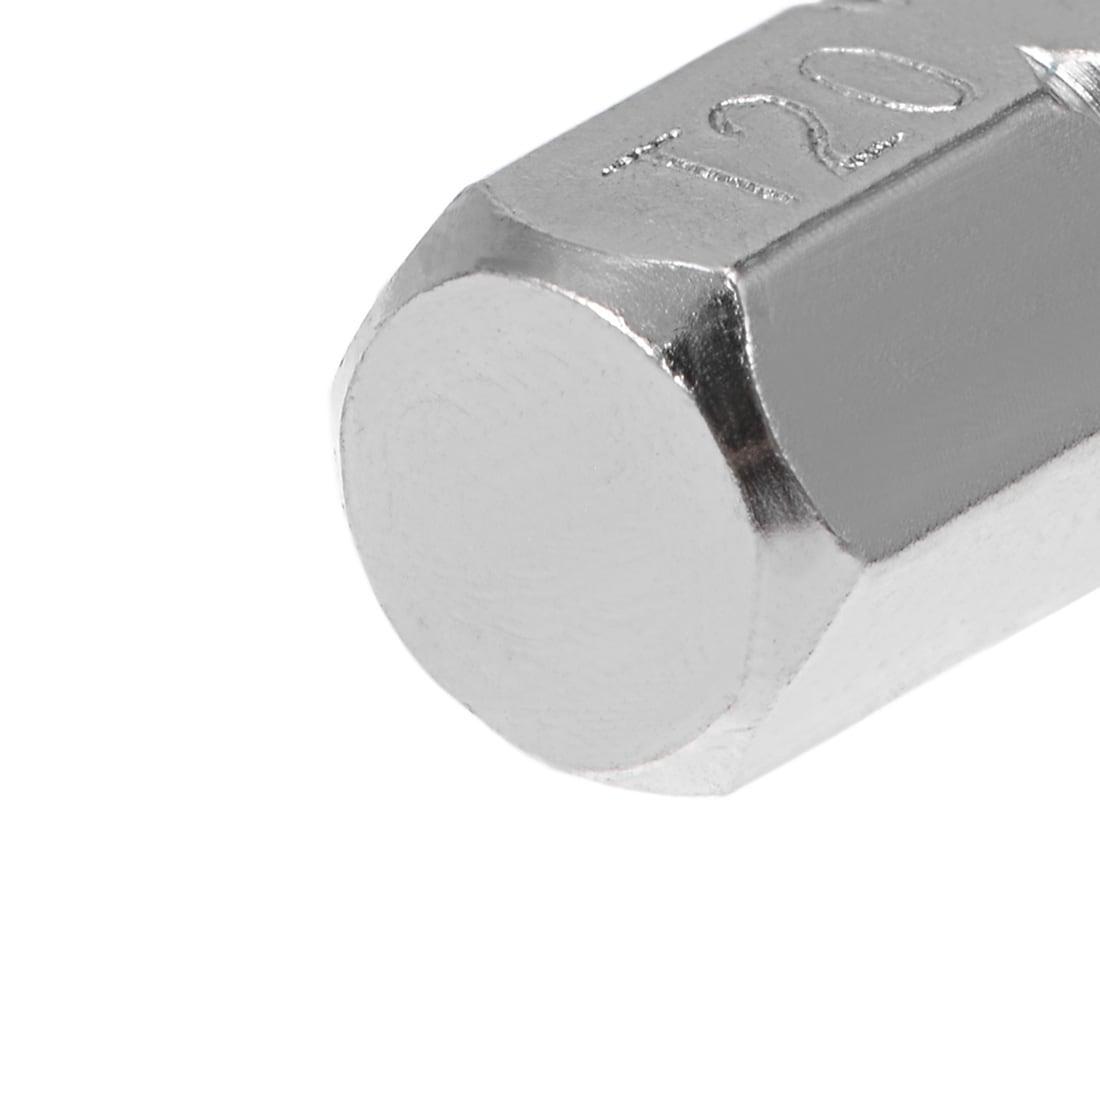 Faithfull Security S2 Grade Steel Screwdriver BitsT20Sx25mm Pack 3